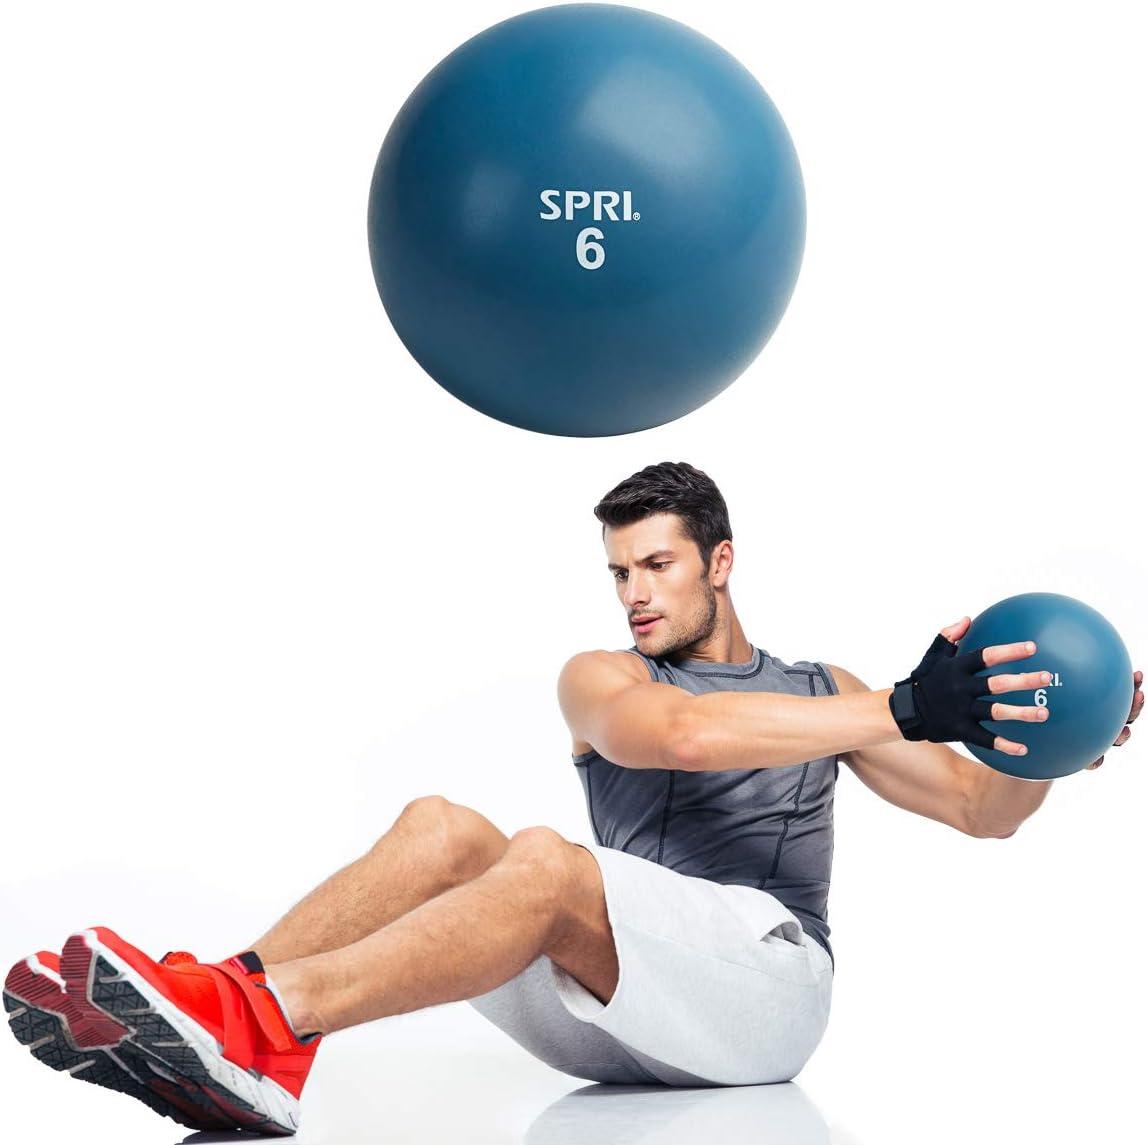 SPRI 6 LB Soft Toning Ball Hand Held Medicine Ball for Exercise Women Men Fitness Strength Training Equipment: Health & Personal Care